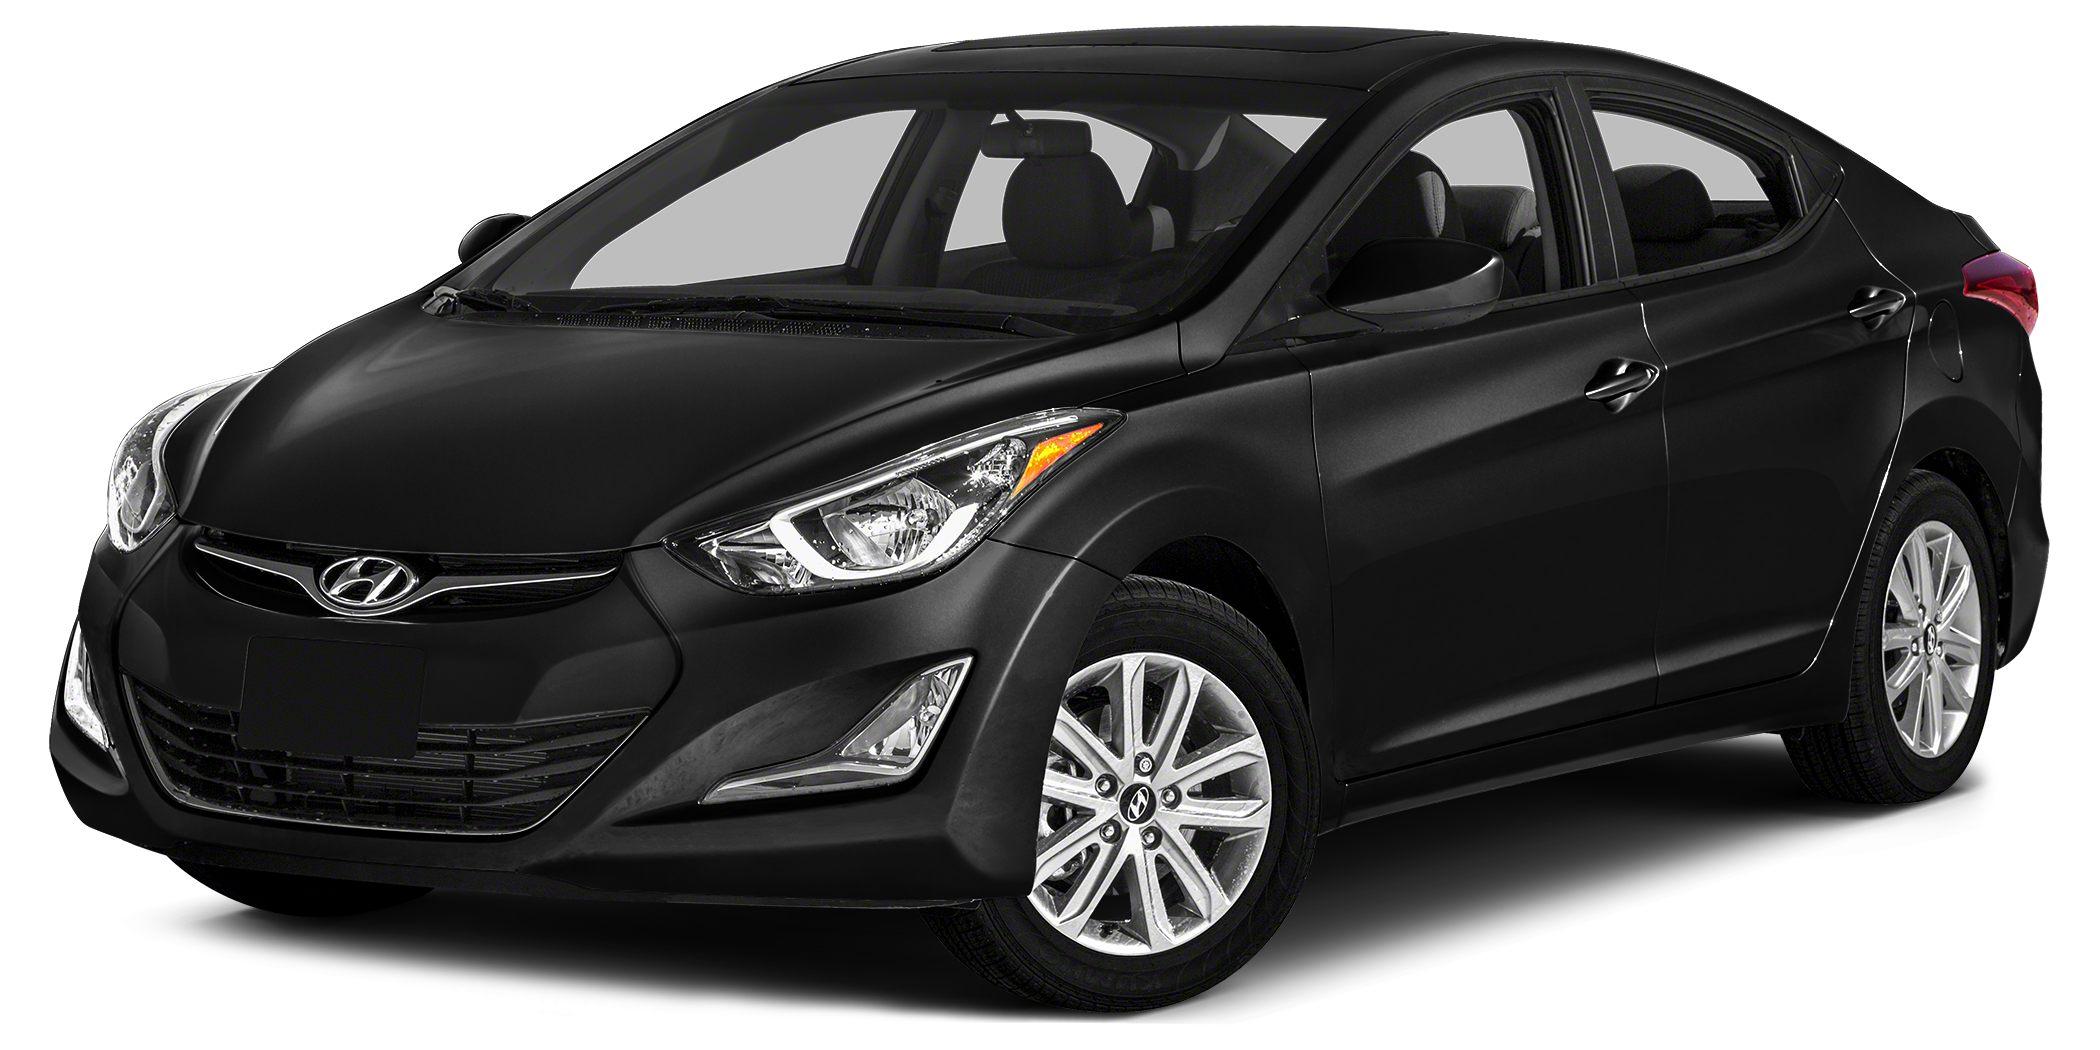 2015 Hyundai Elantra SE Home of the 20yr200k mile warranty Miles 15Color Shale Gray Metallic S